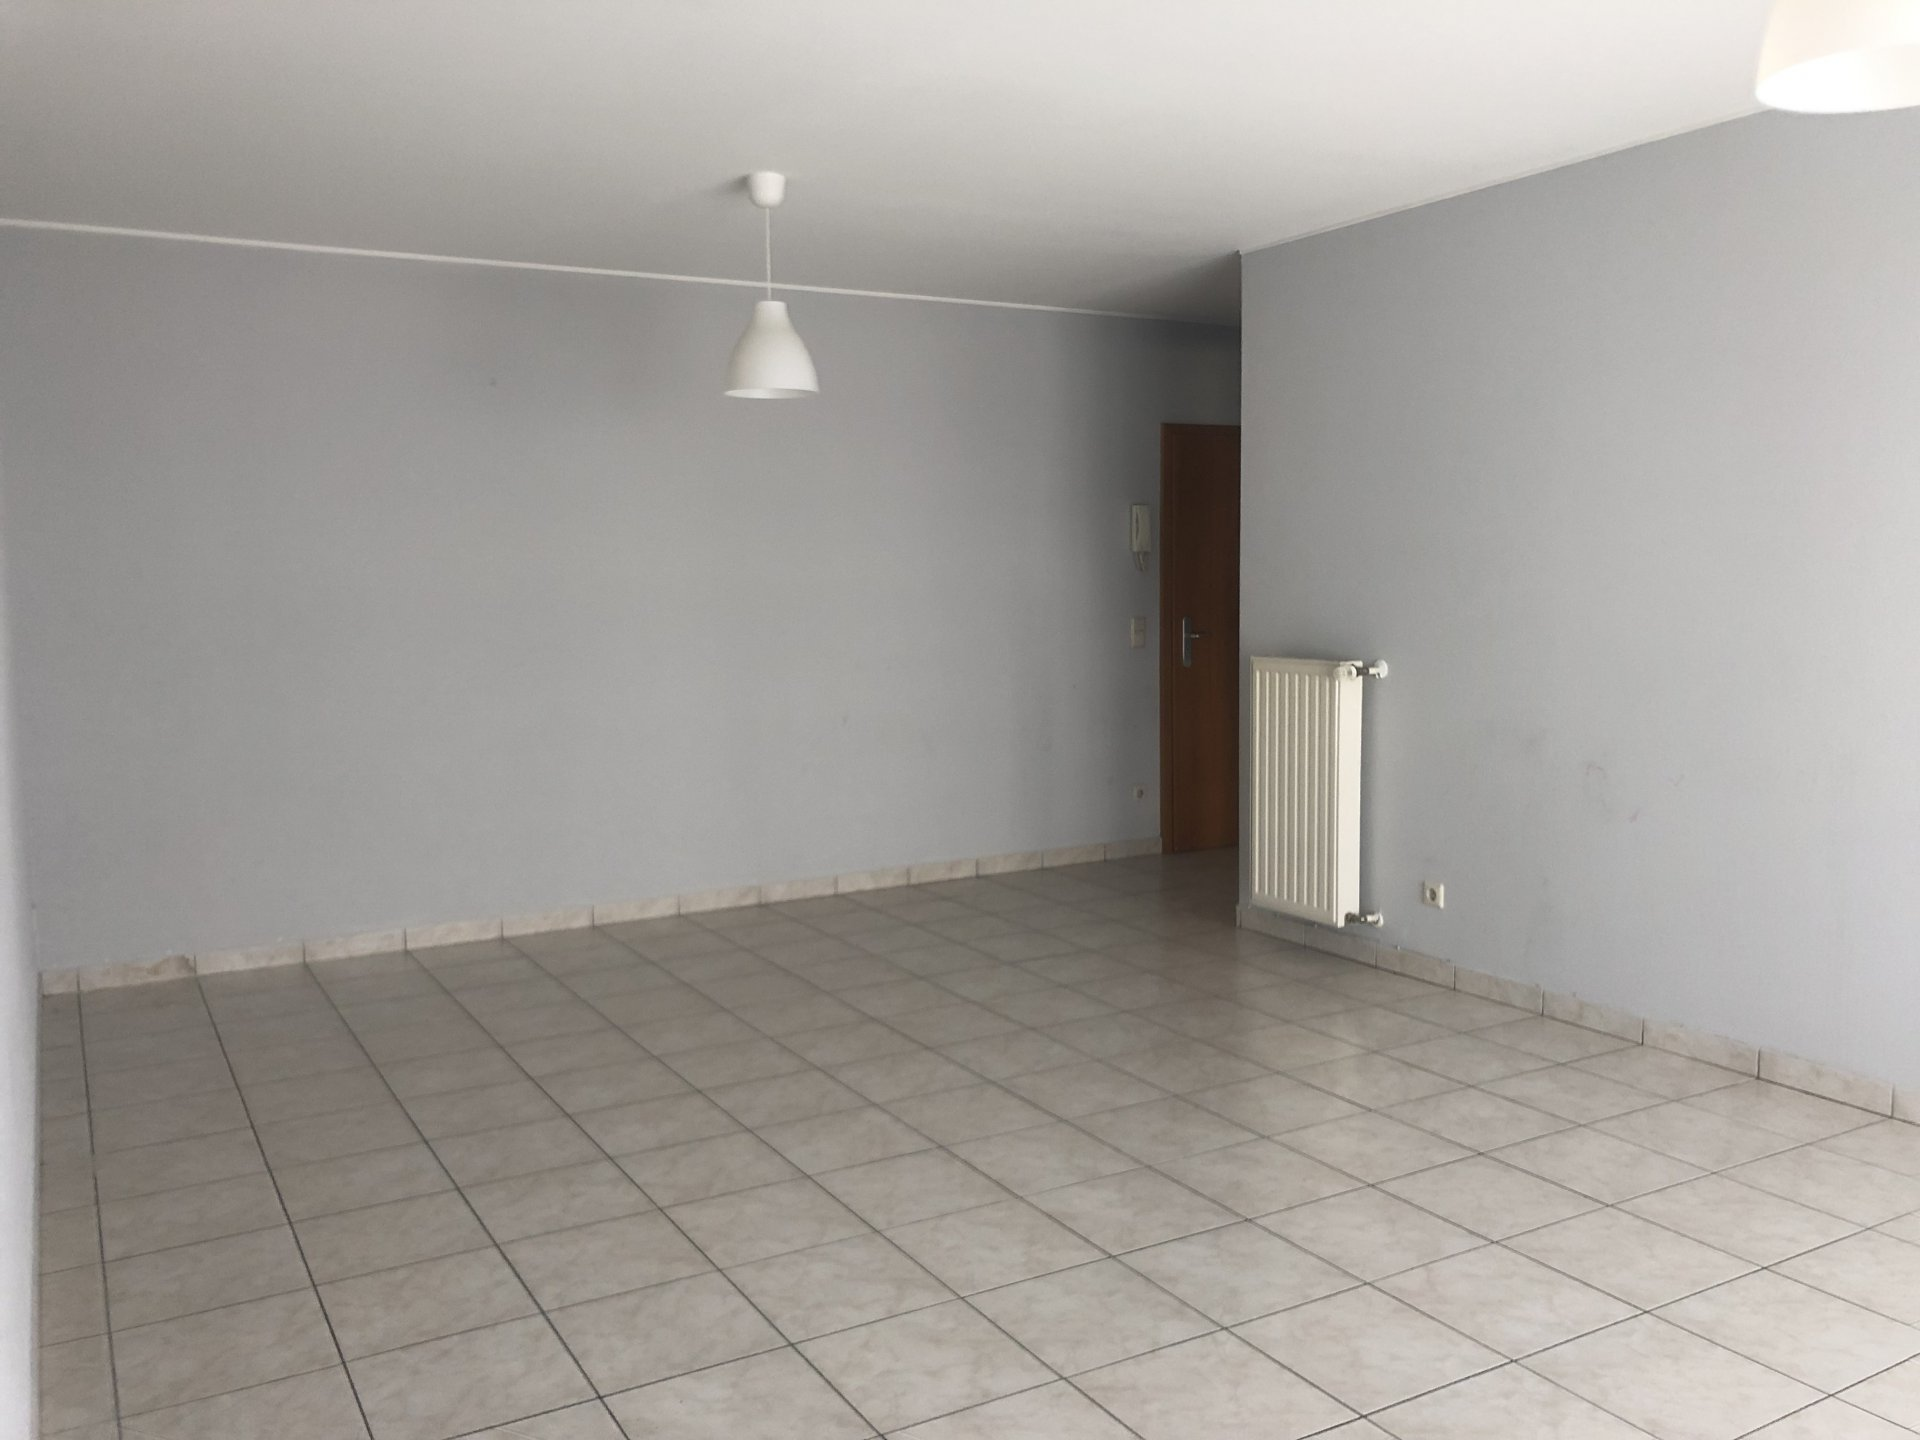 Rental Apartment - Differdange - Luxembourg